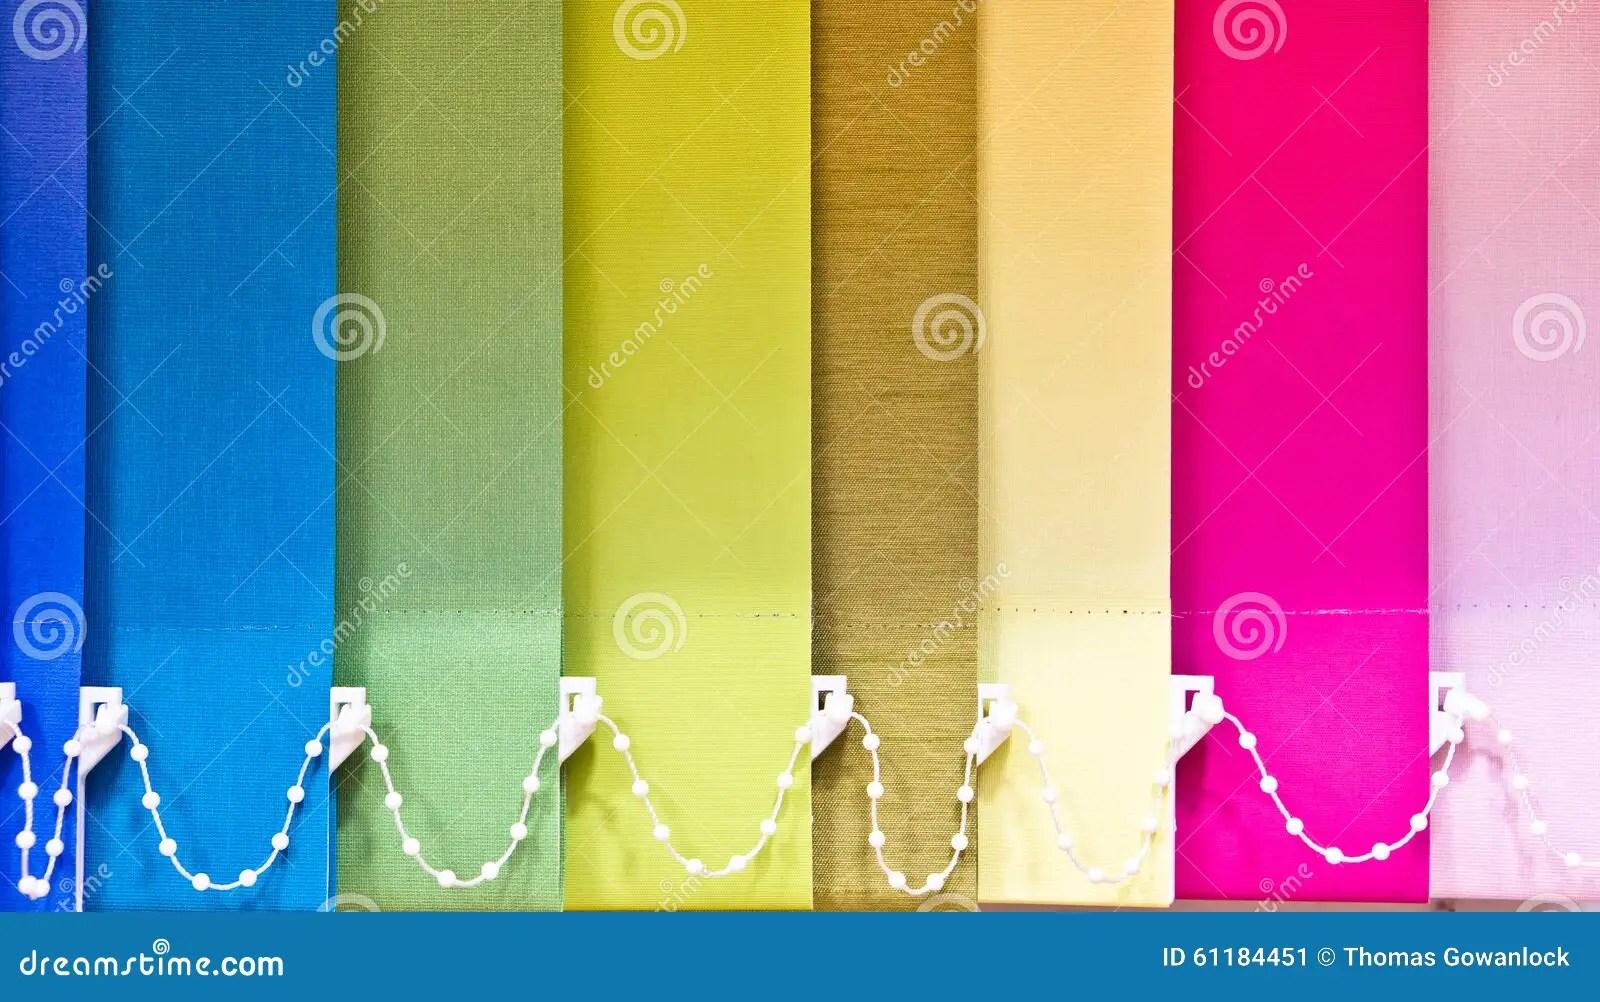 Bunte Vorhange Simple Bunte Vorhnge With Bunte Vorhange